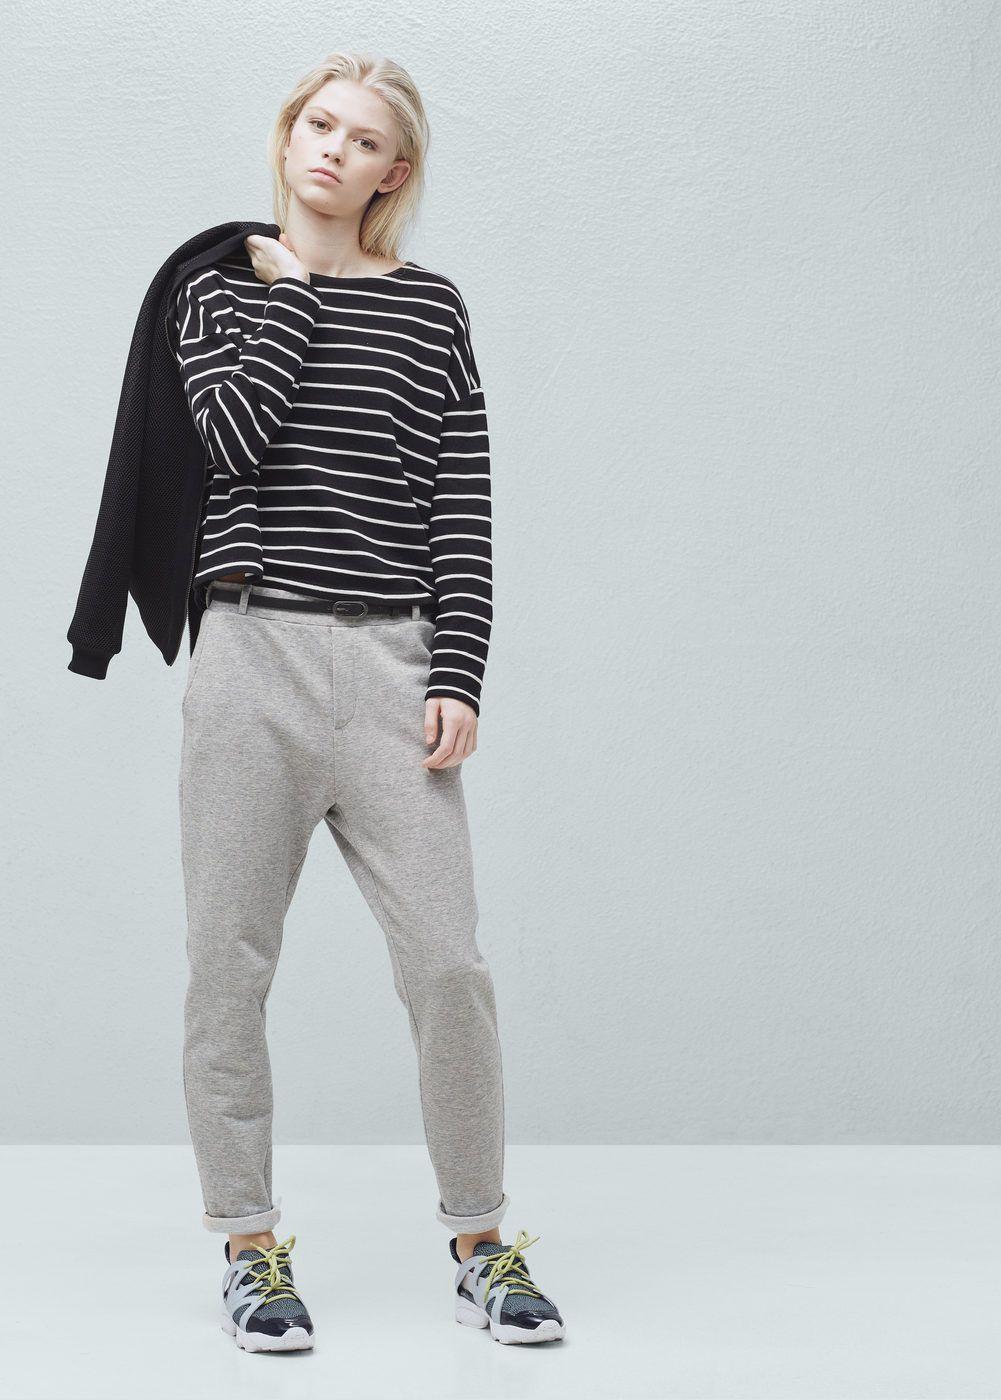 Pocket Jogger Trousers Woman Mango Hungary Pants For Women Trouser Pants Trousers